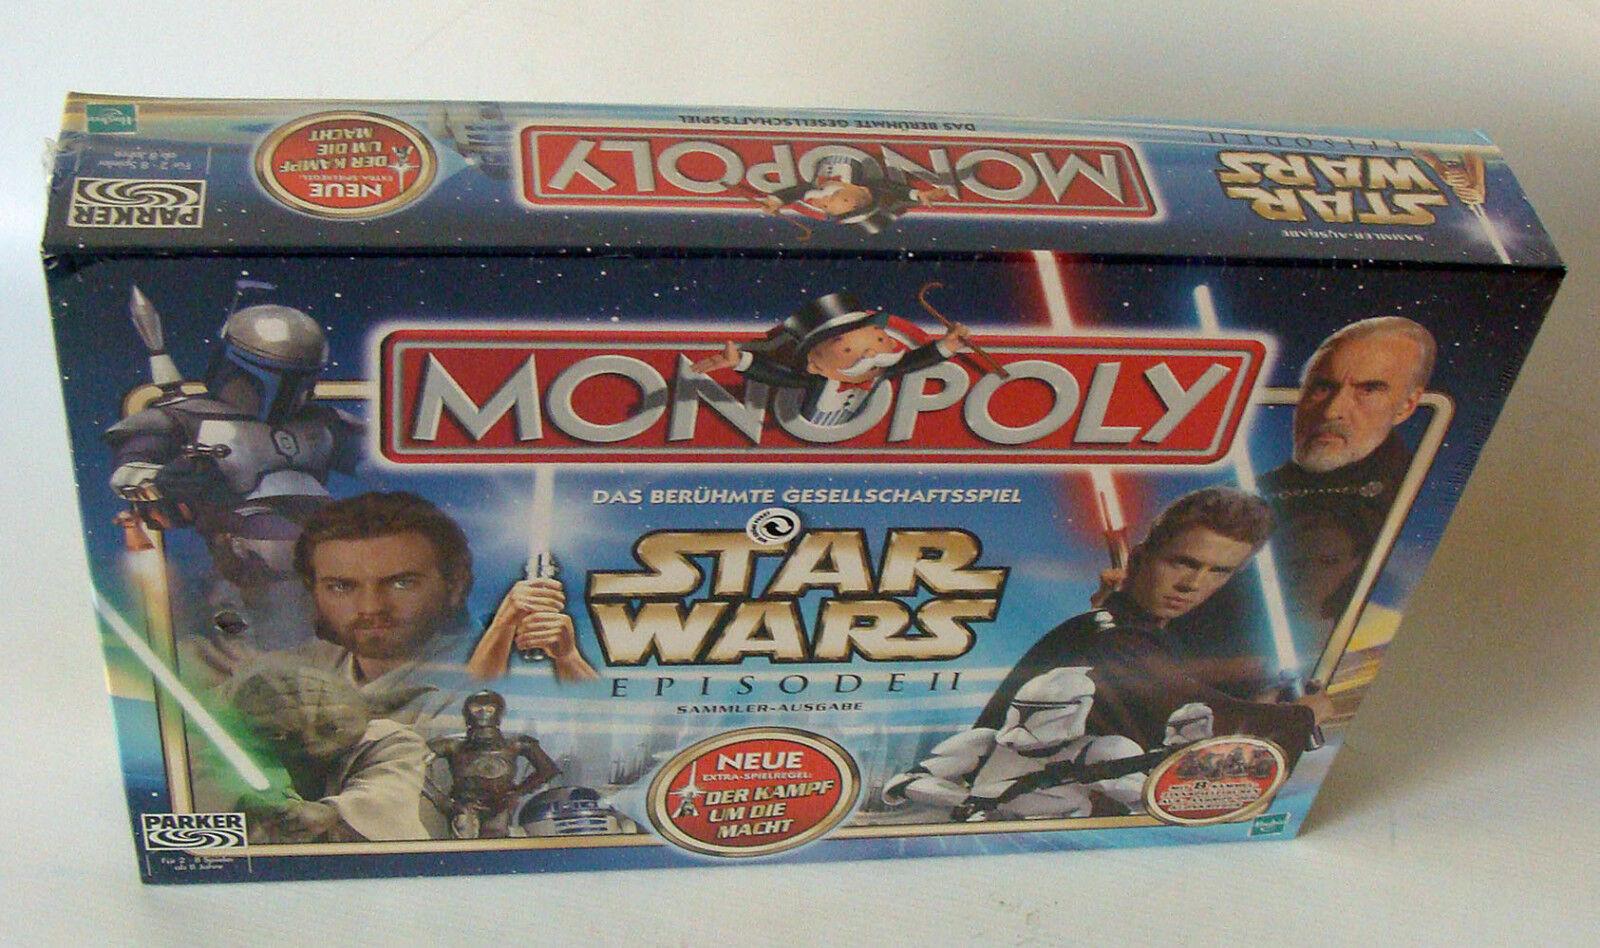 Monopoly Star Wars - Episode II Für 2-8 Spieler Hasbro Hasbro Hasbro 8+ - Neu c93c68